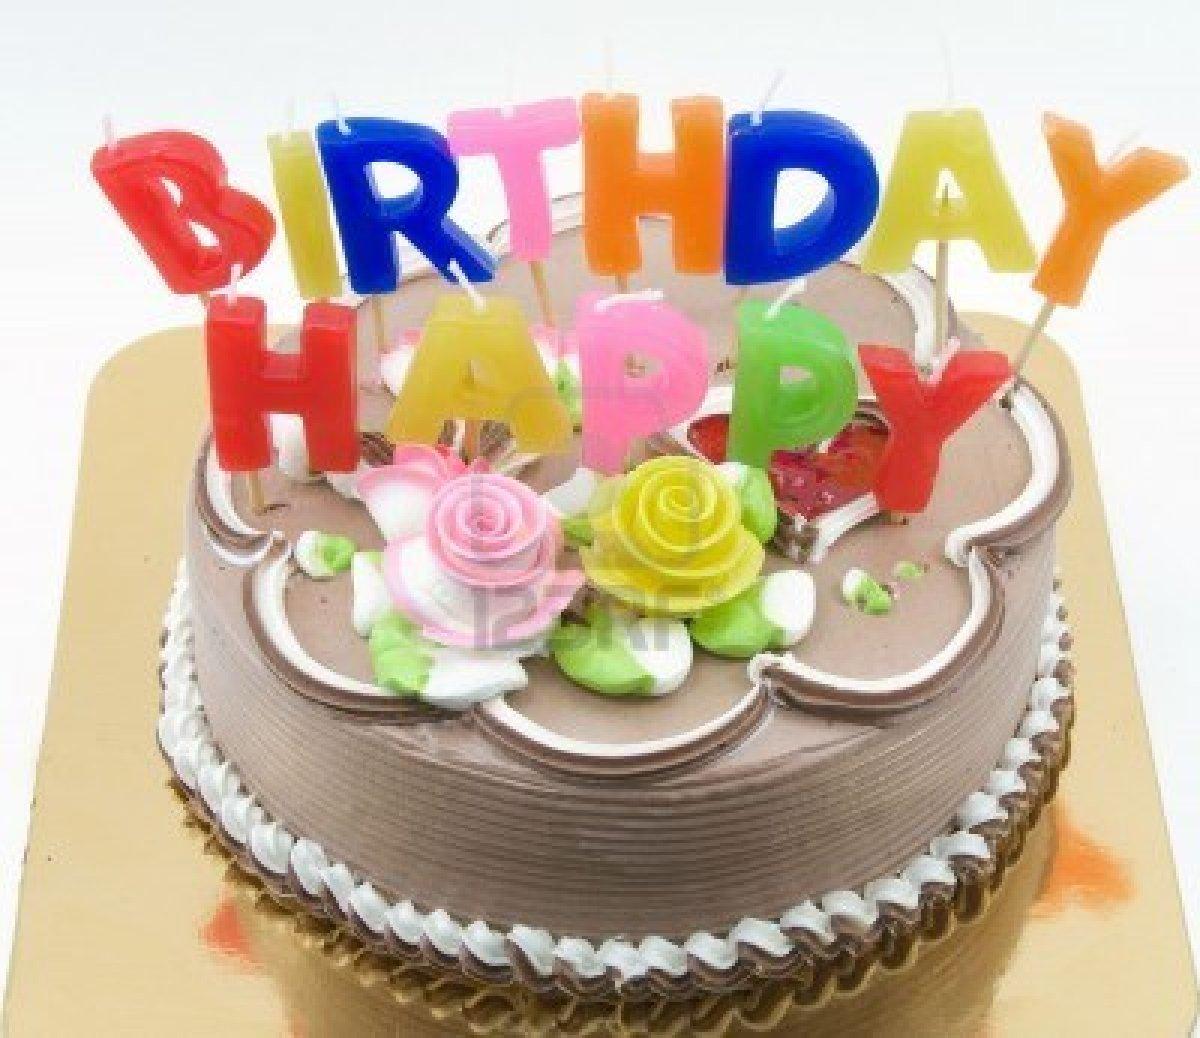 Happy Birthday J!!! 3895732-big-birthday-cakeef